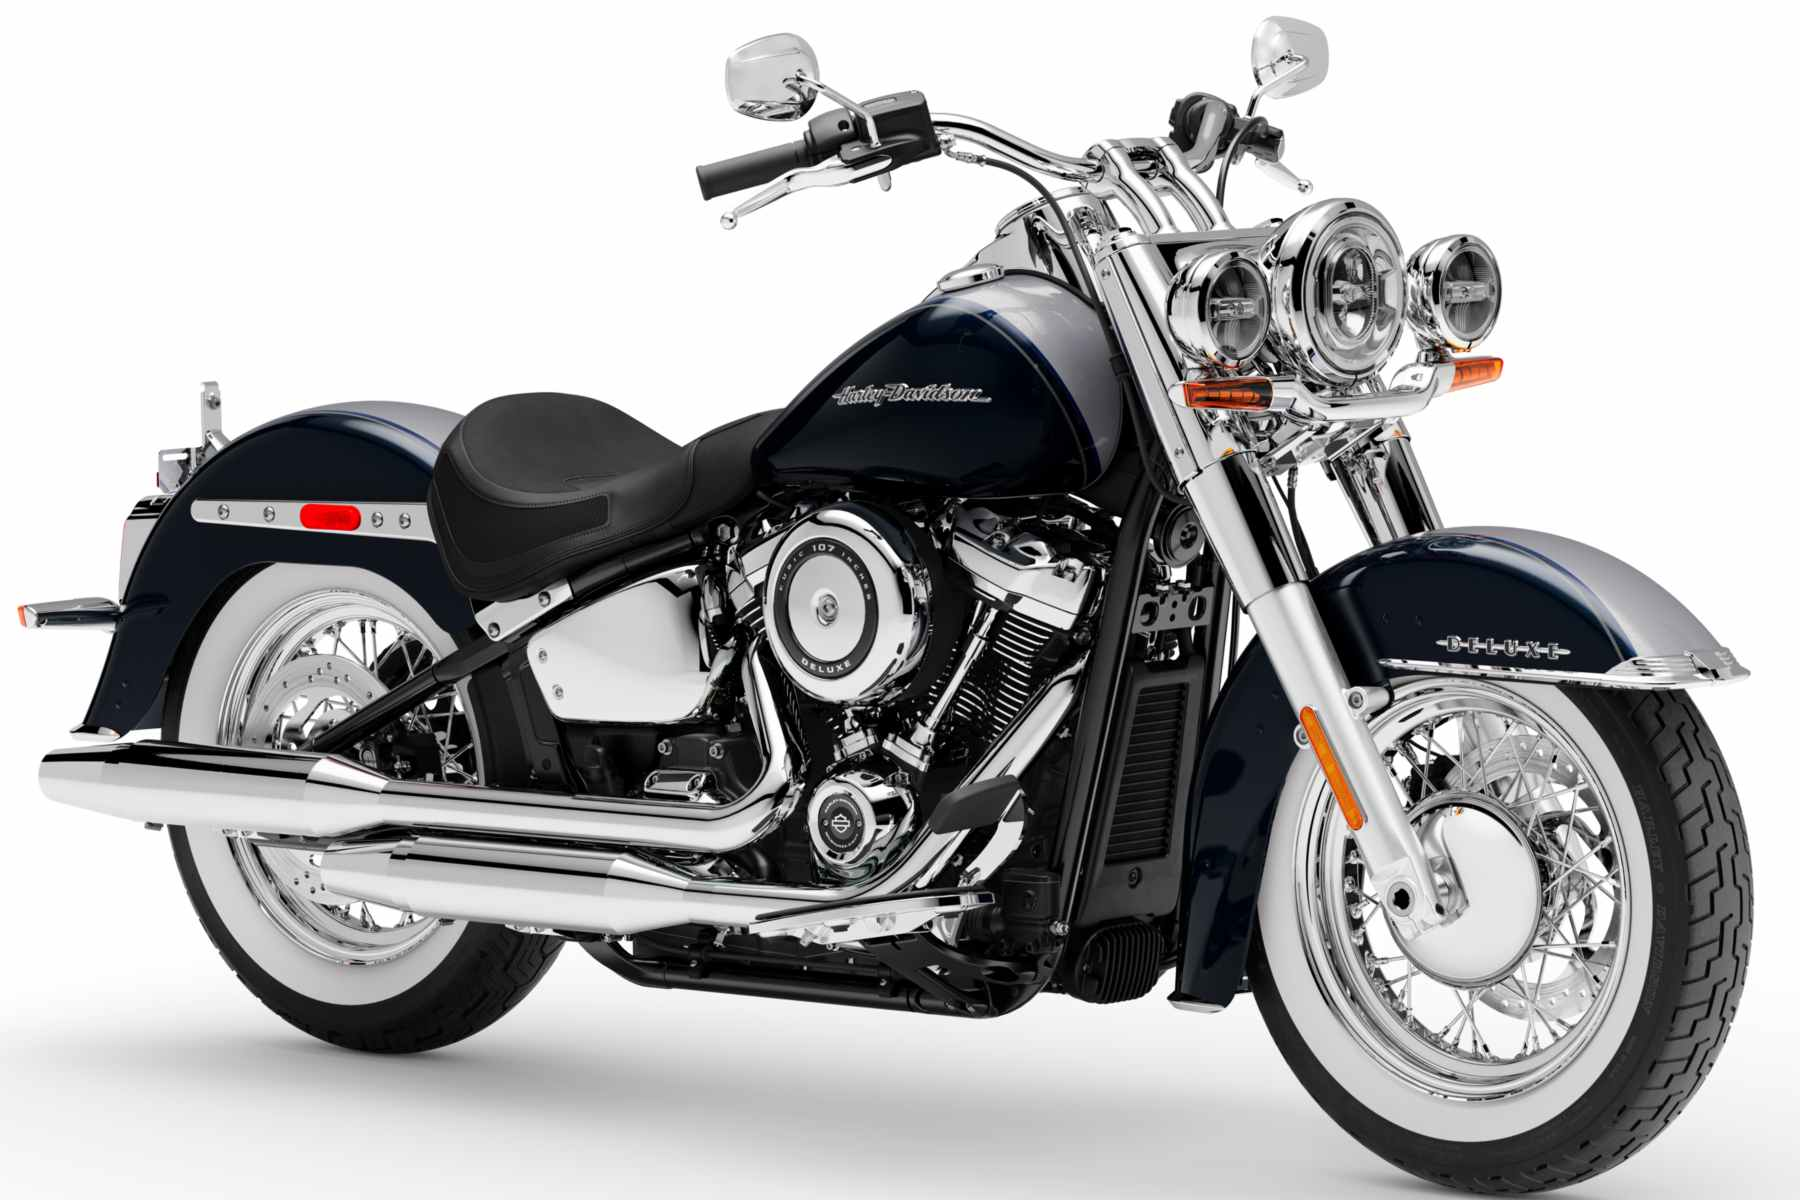 Harley-Davidson Softail Deluxe 2019